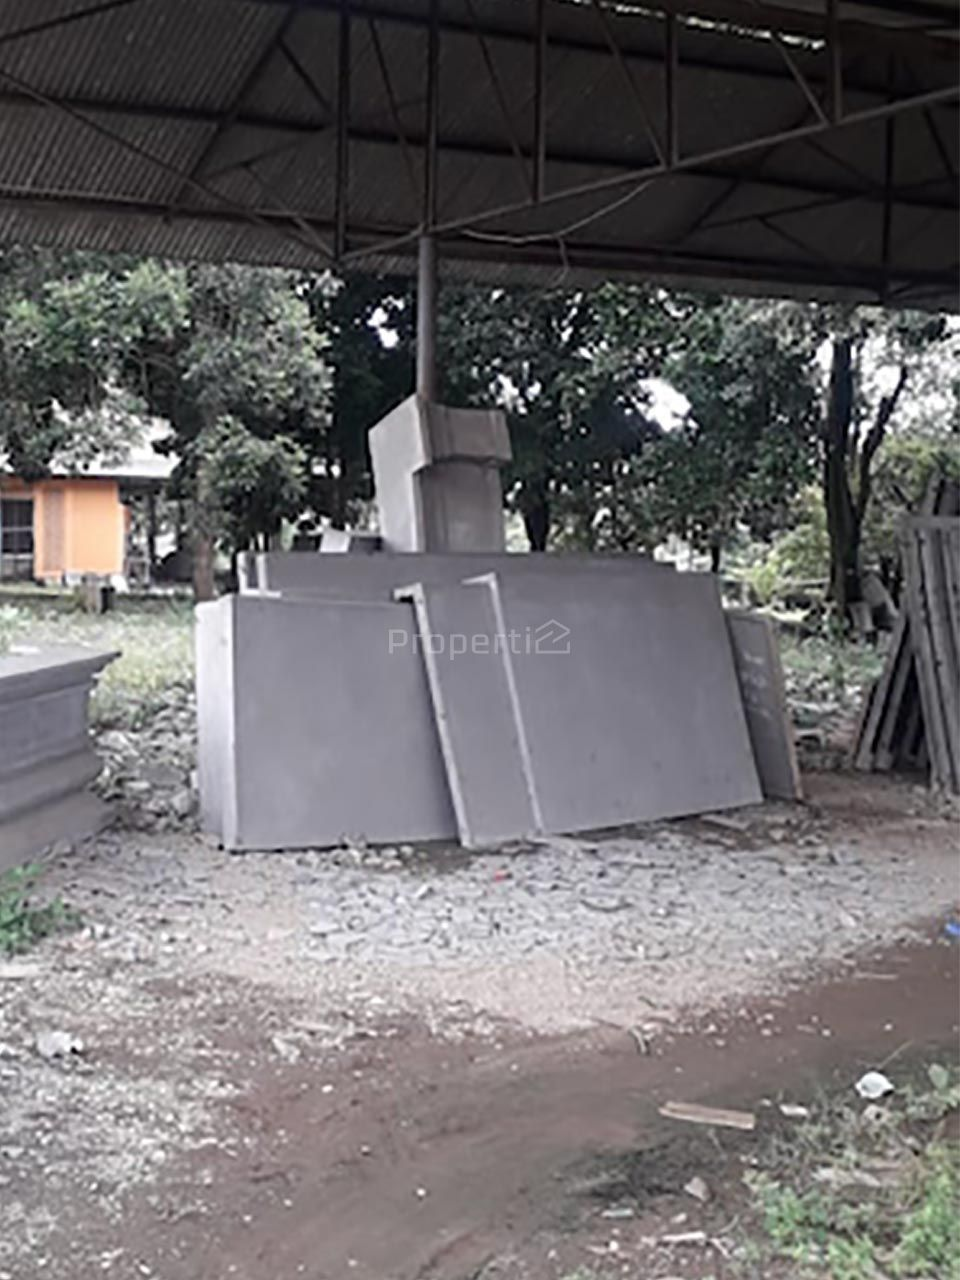 Land for Housing Allocation in Cibinong, Jawa Barat